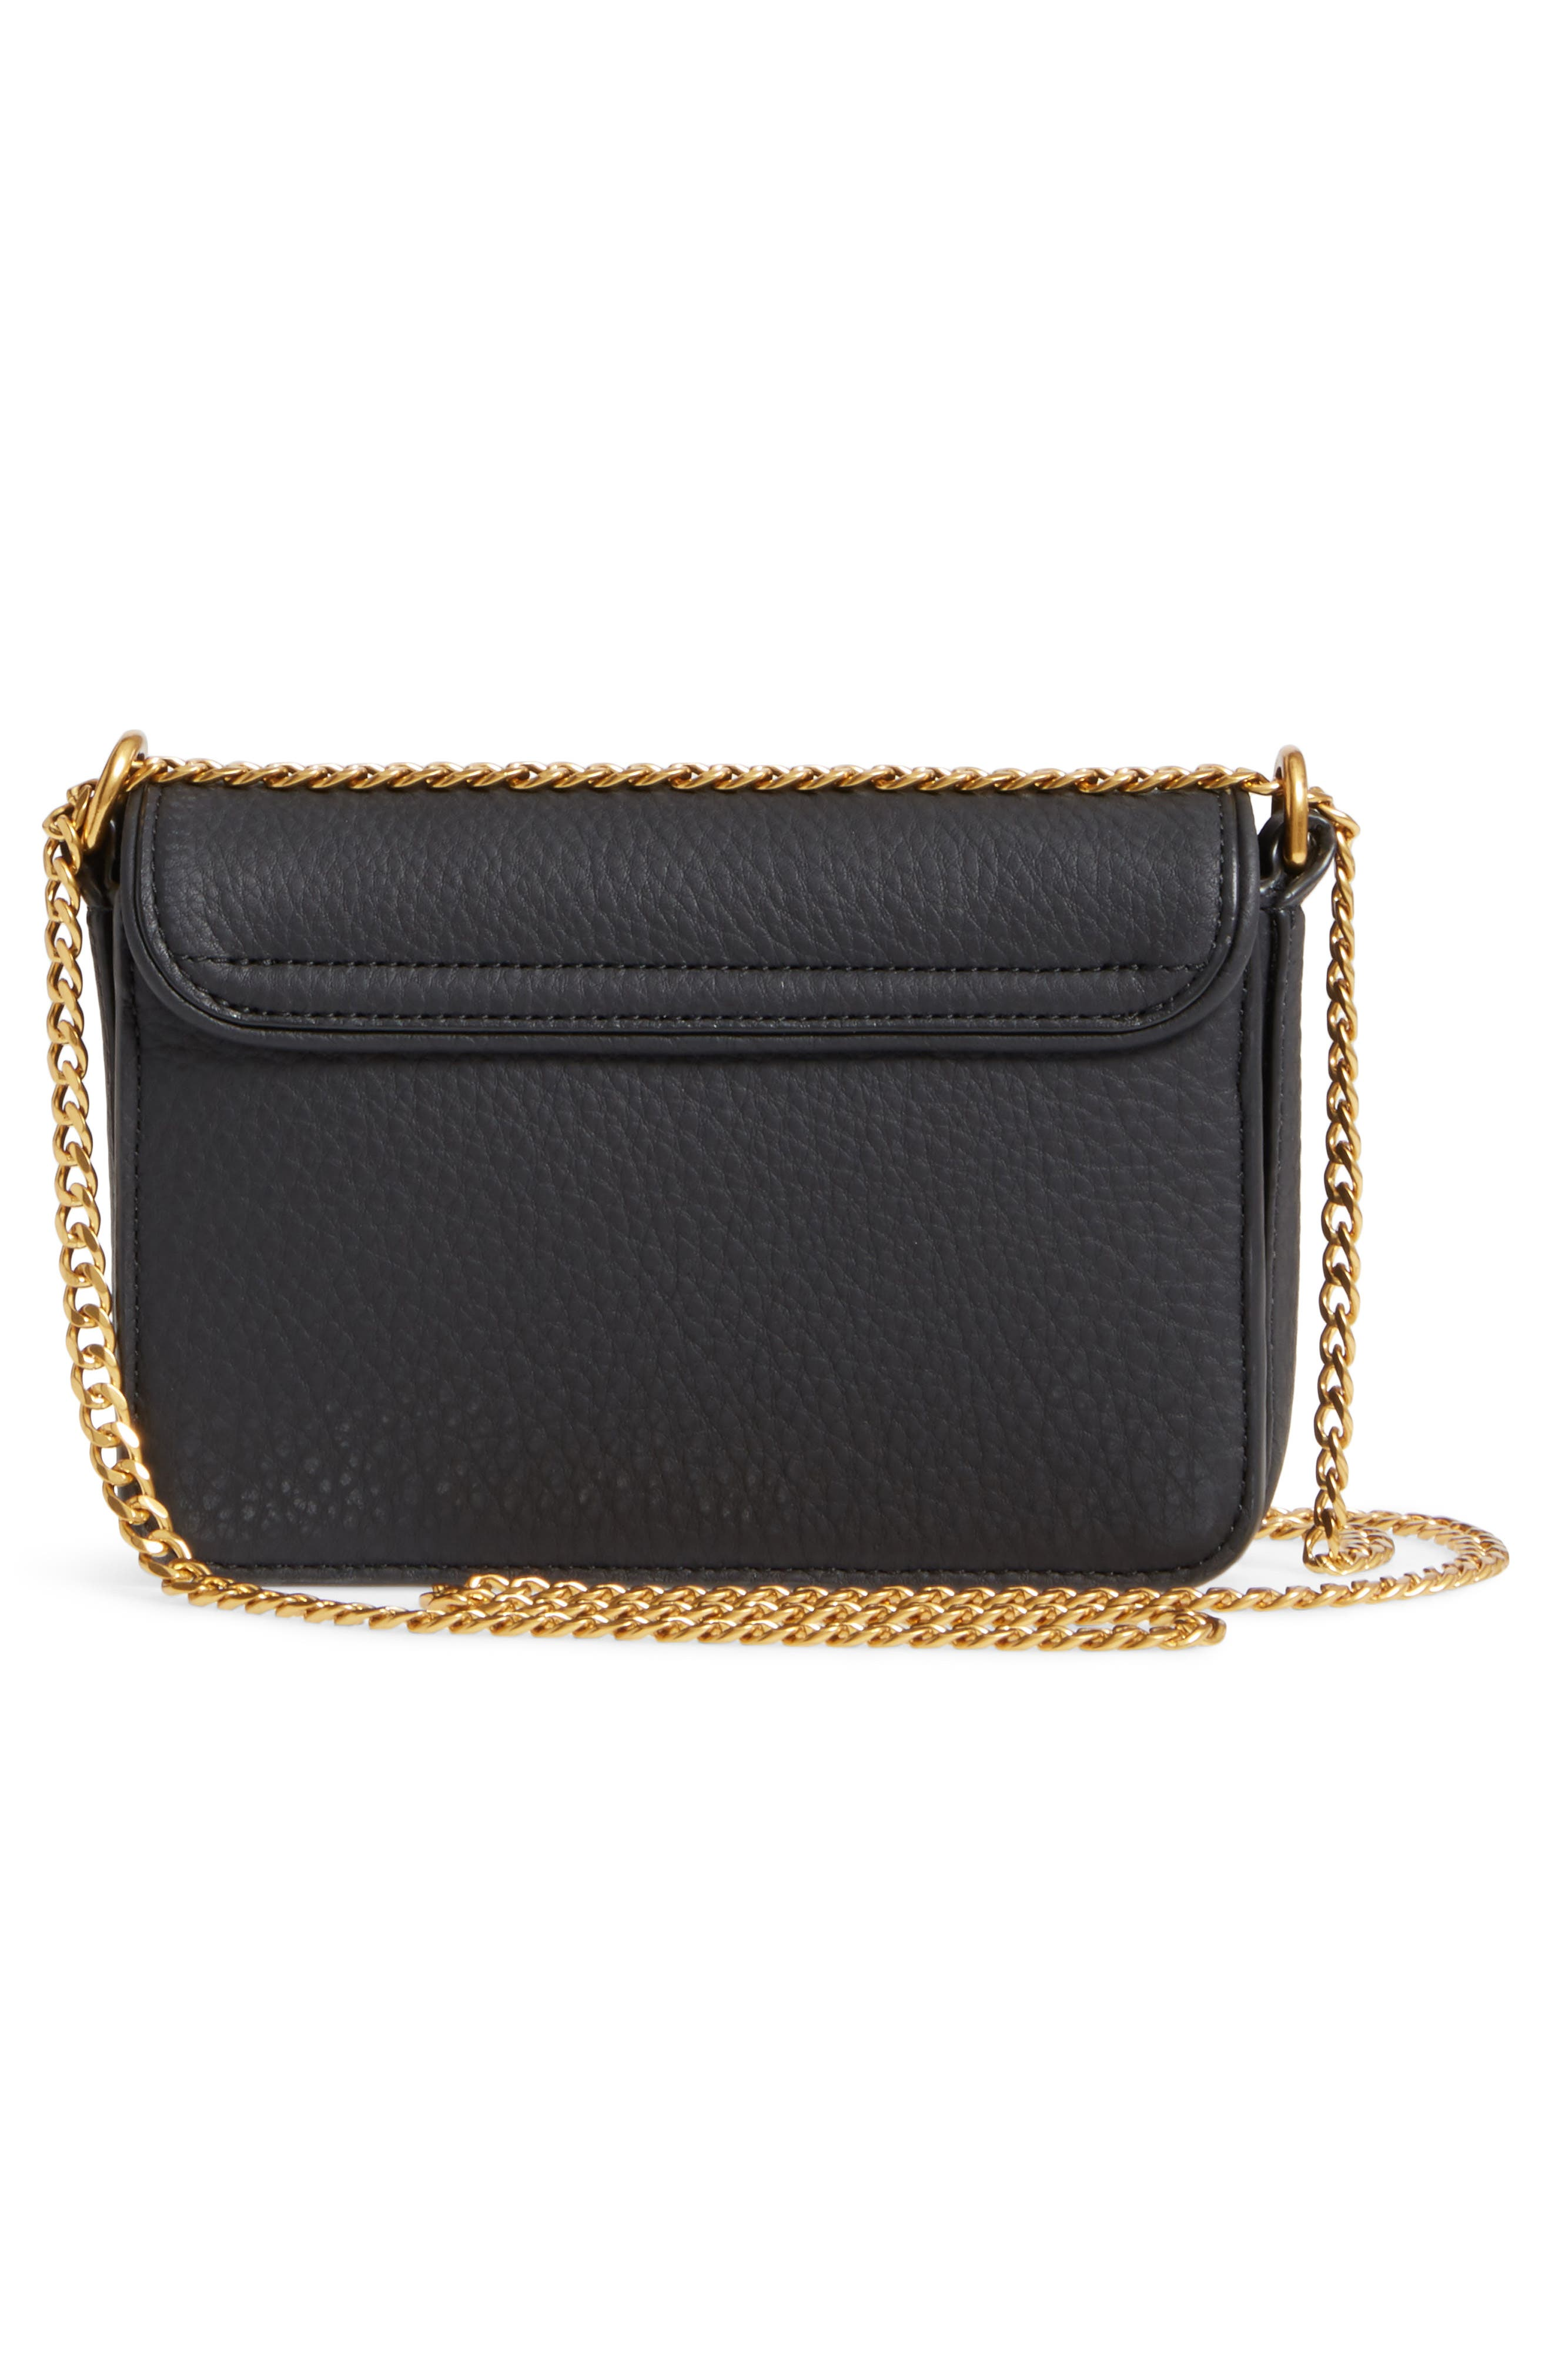 TORY BURCH,                             Mini Chelsea Leather Convertible Crossbody Bag,                             Alternate thumbnail 3, color,                             001